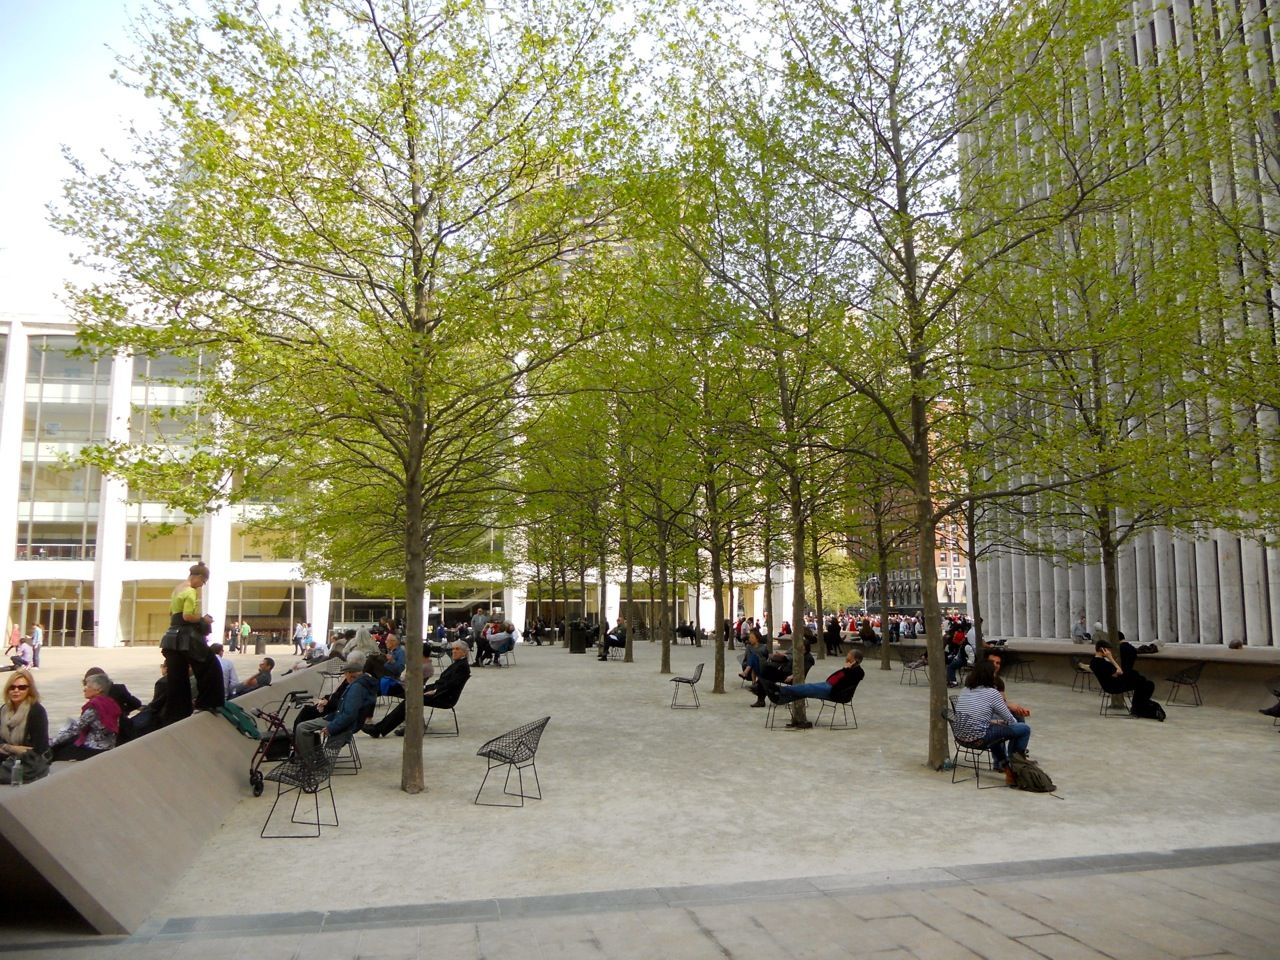 Lc 2 Jpg 1280 960 Urban Landscape Design Landscape Architecture Design Landscape Plaza